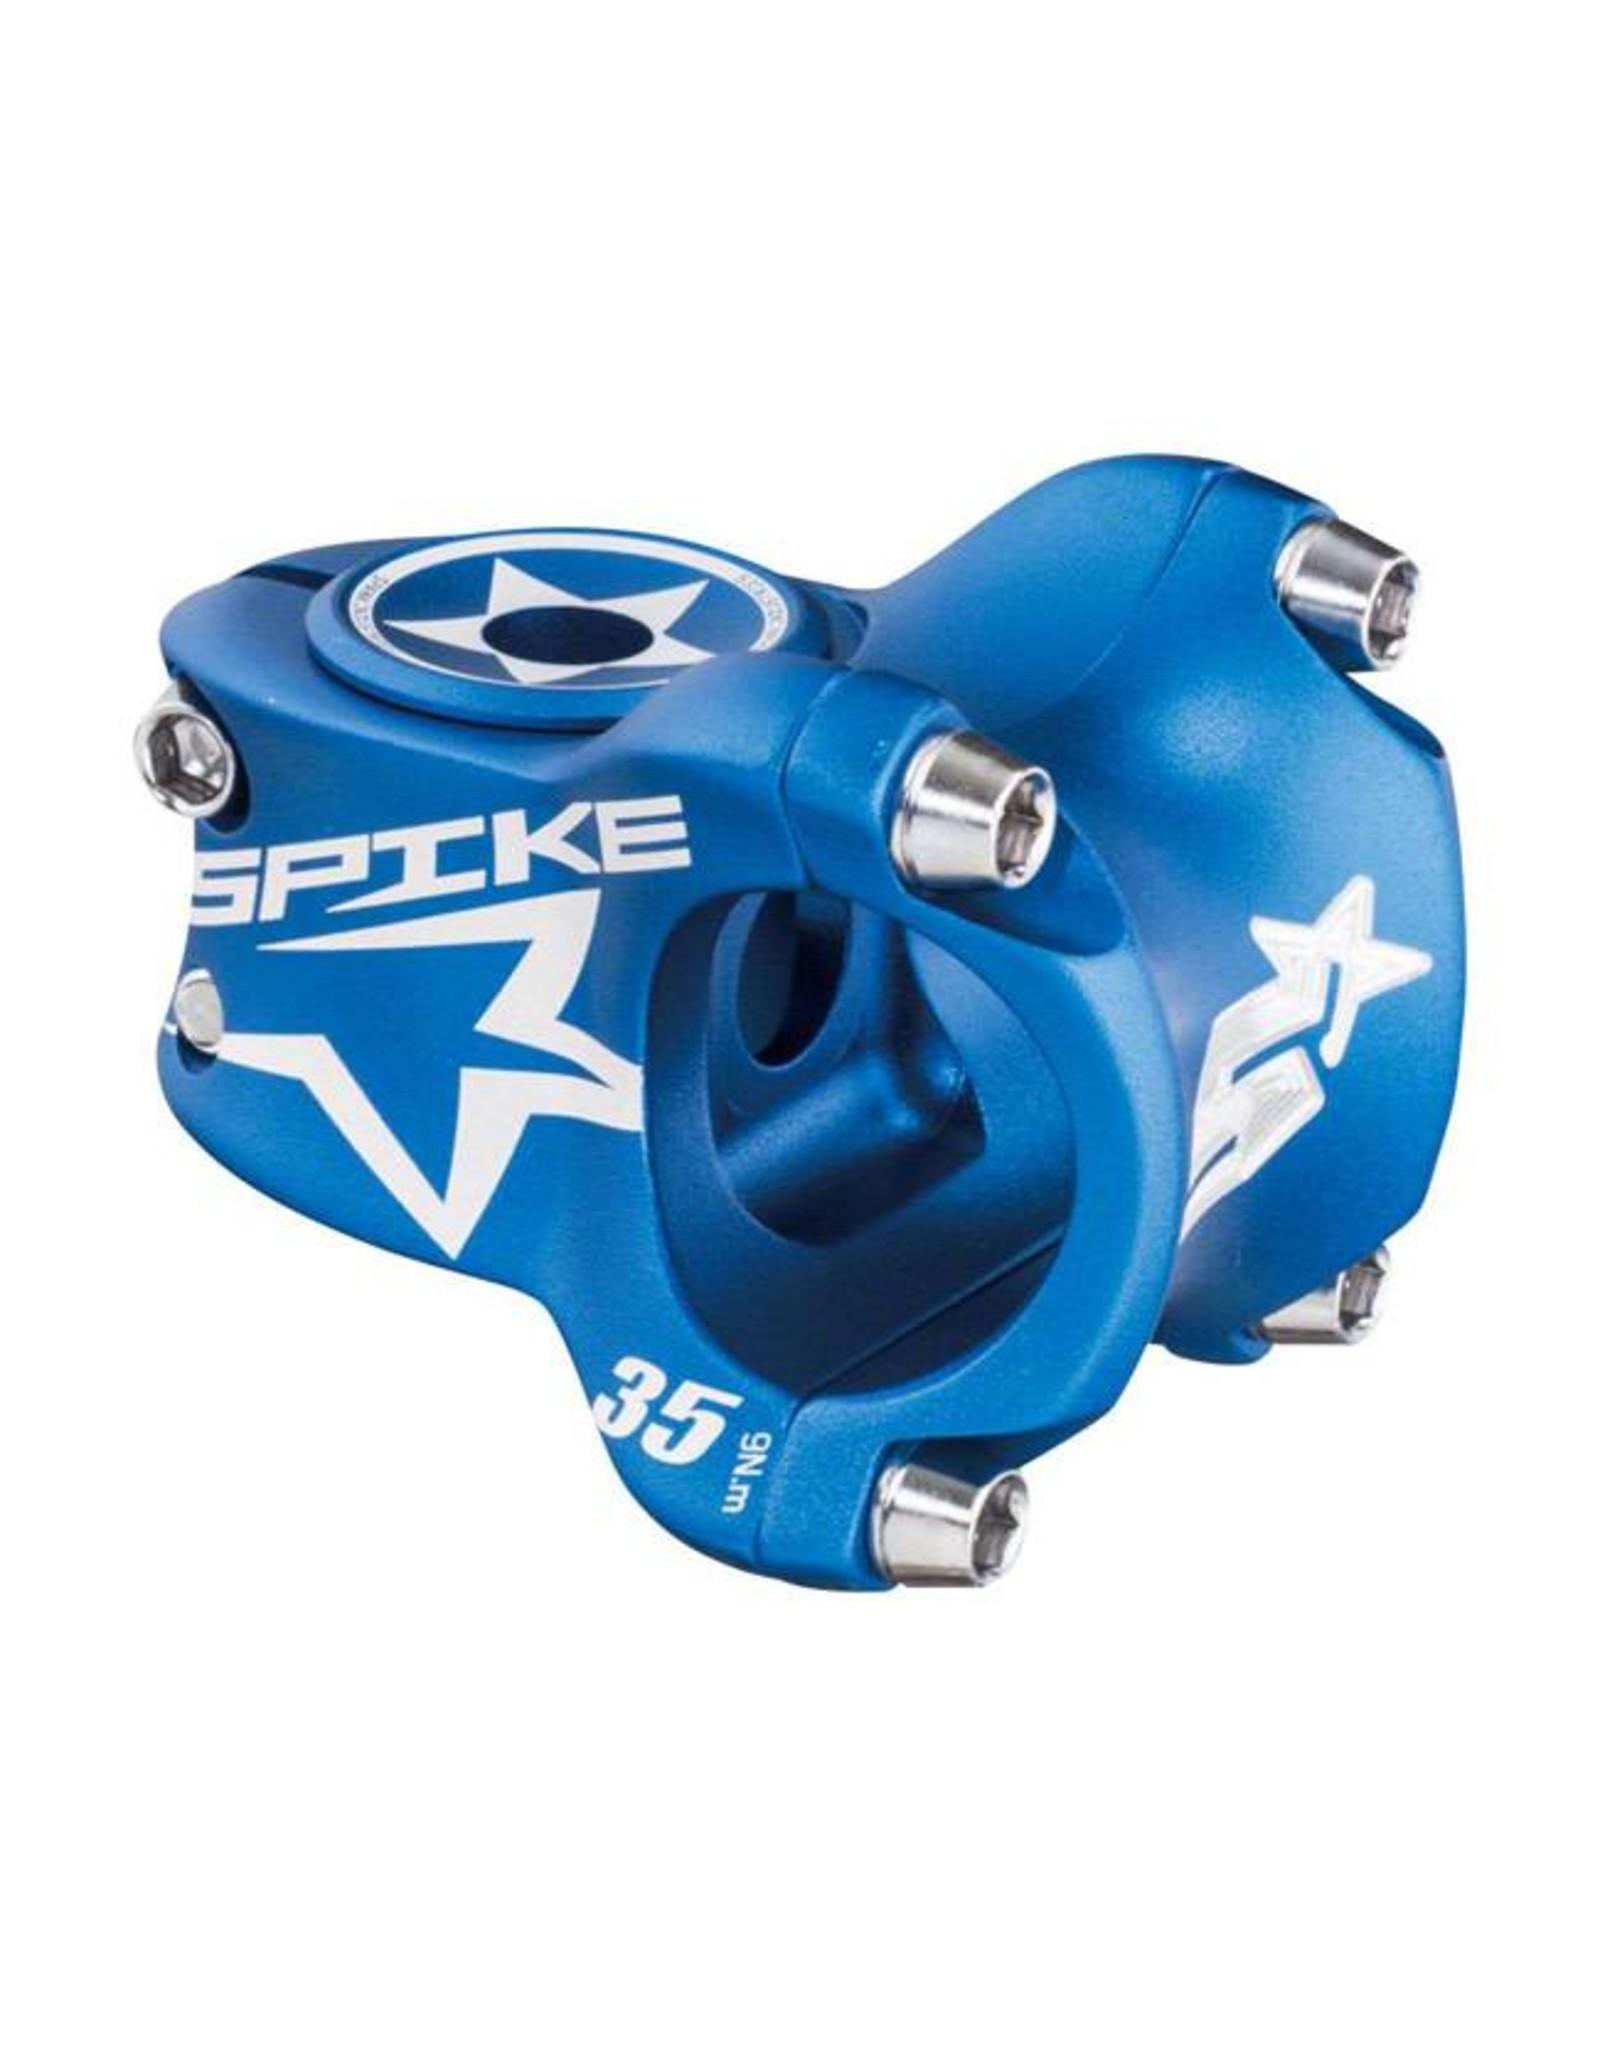 Spank Spank Spike Race Stem 35mm Length, 31.8 Bar Clamp, Matte Blue